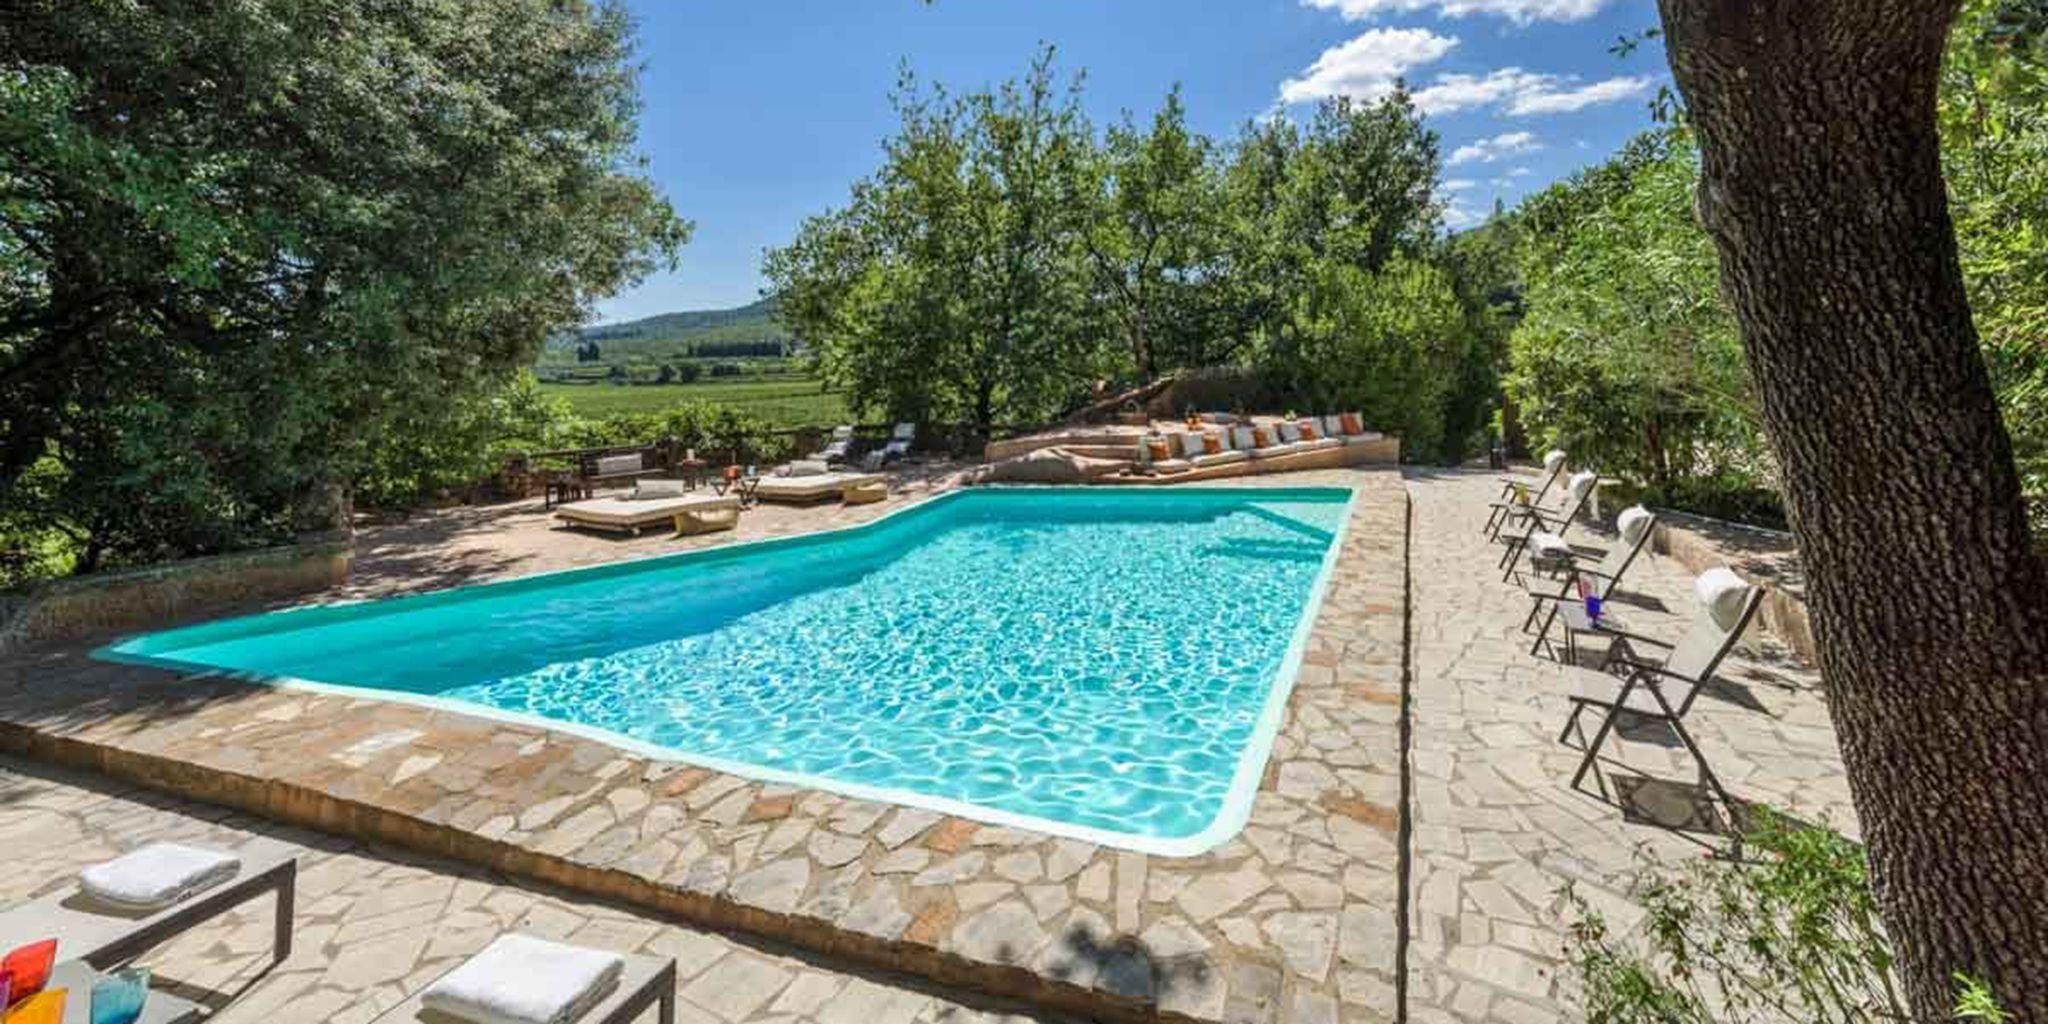 Bravo Holiday Residences, Villa Allegra